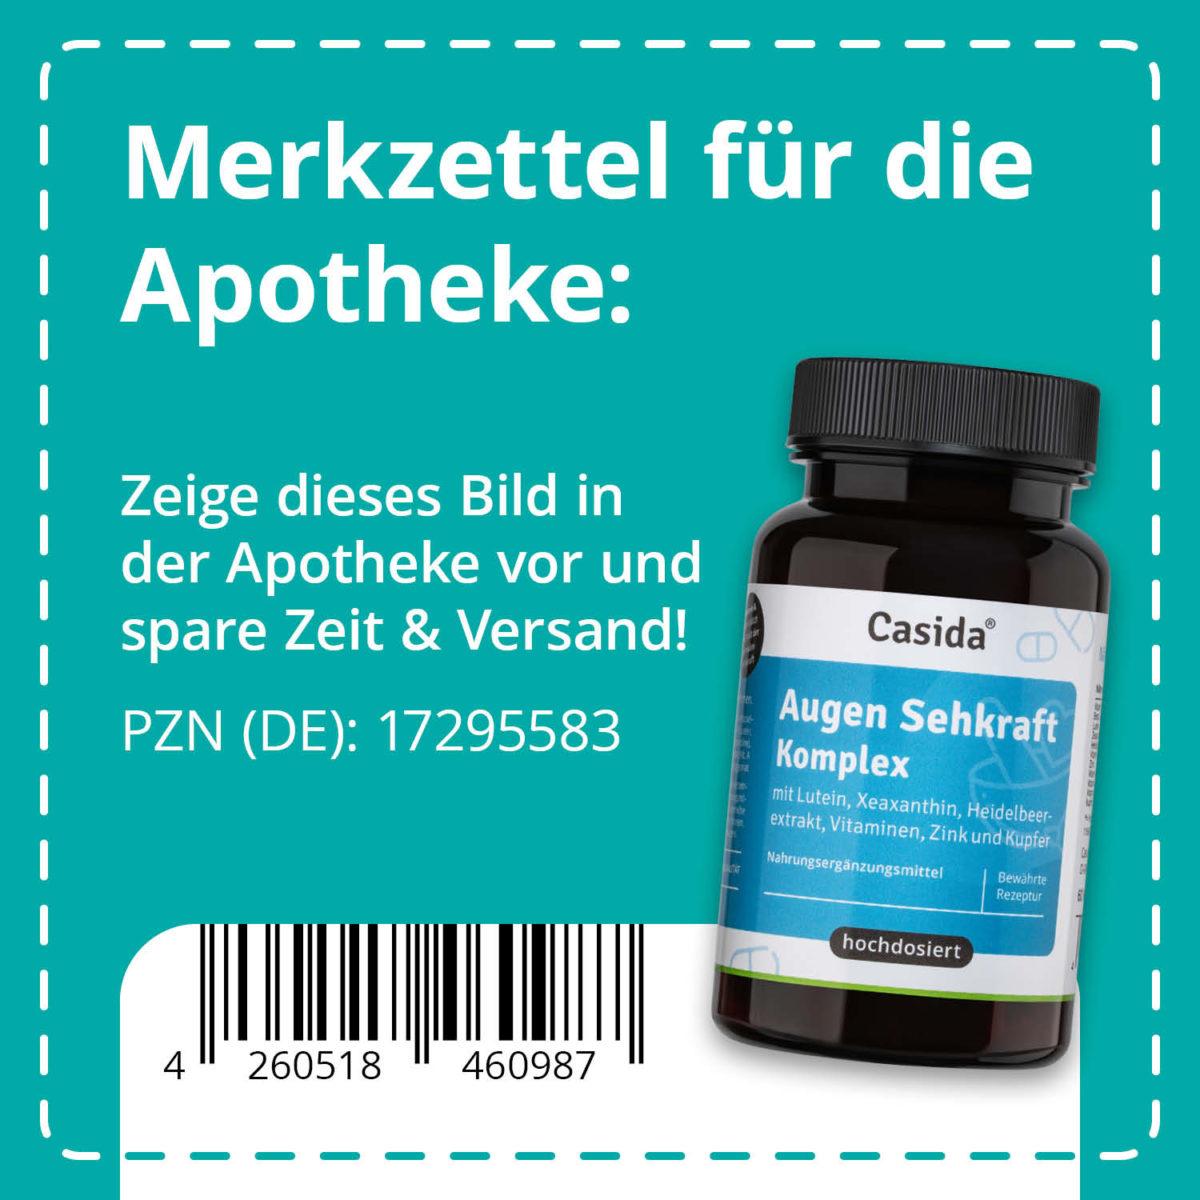 Casida Eye-Sight Complex - 60 capsules 17295583 PZN pharmacy Vitammin A C E B6 B2 Beta Carotine